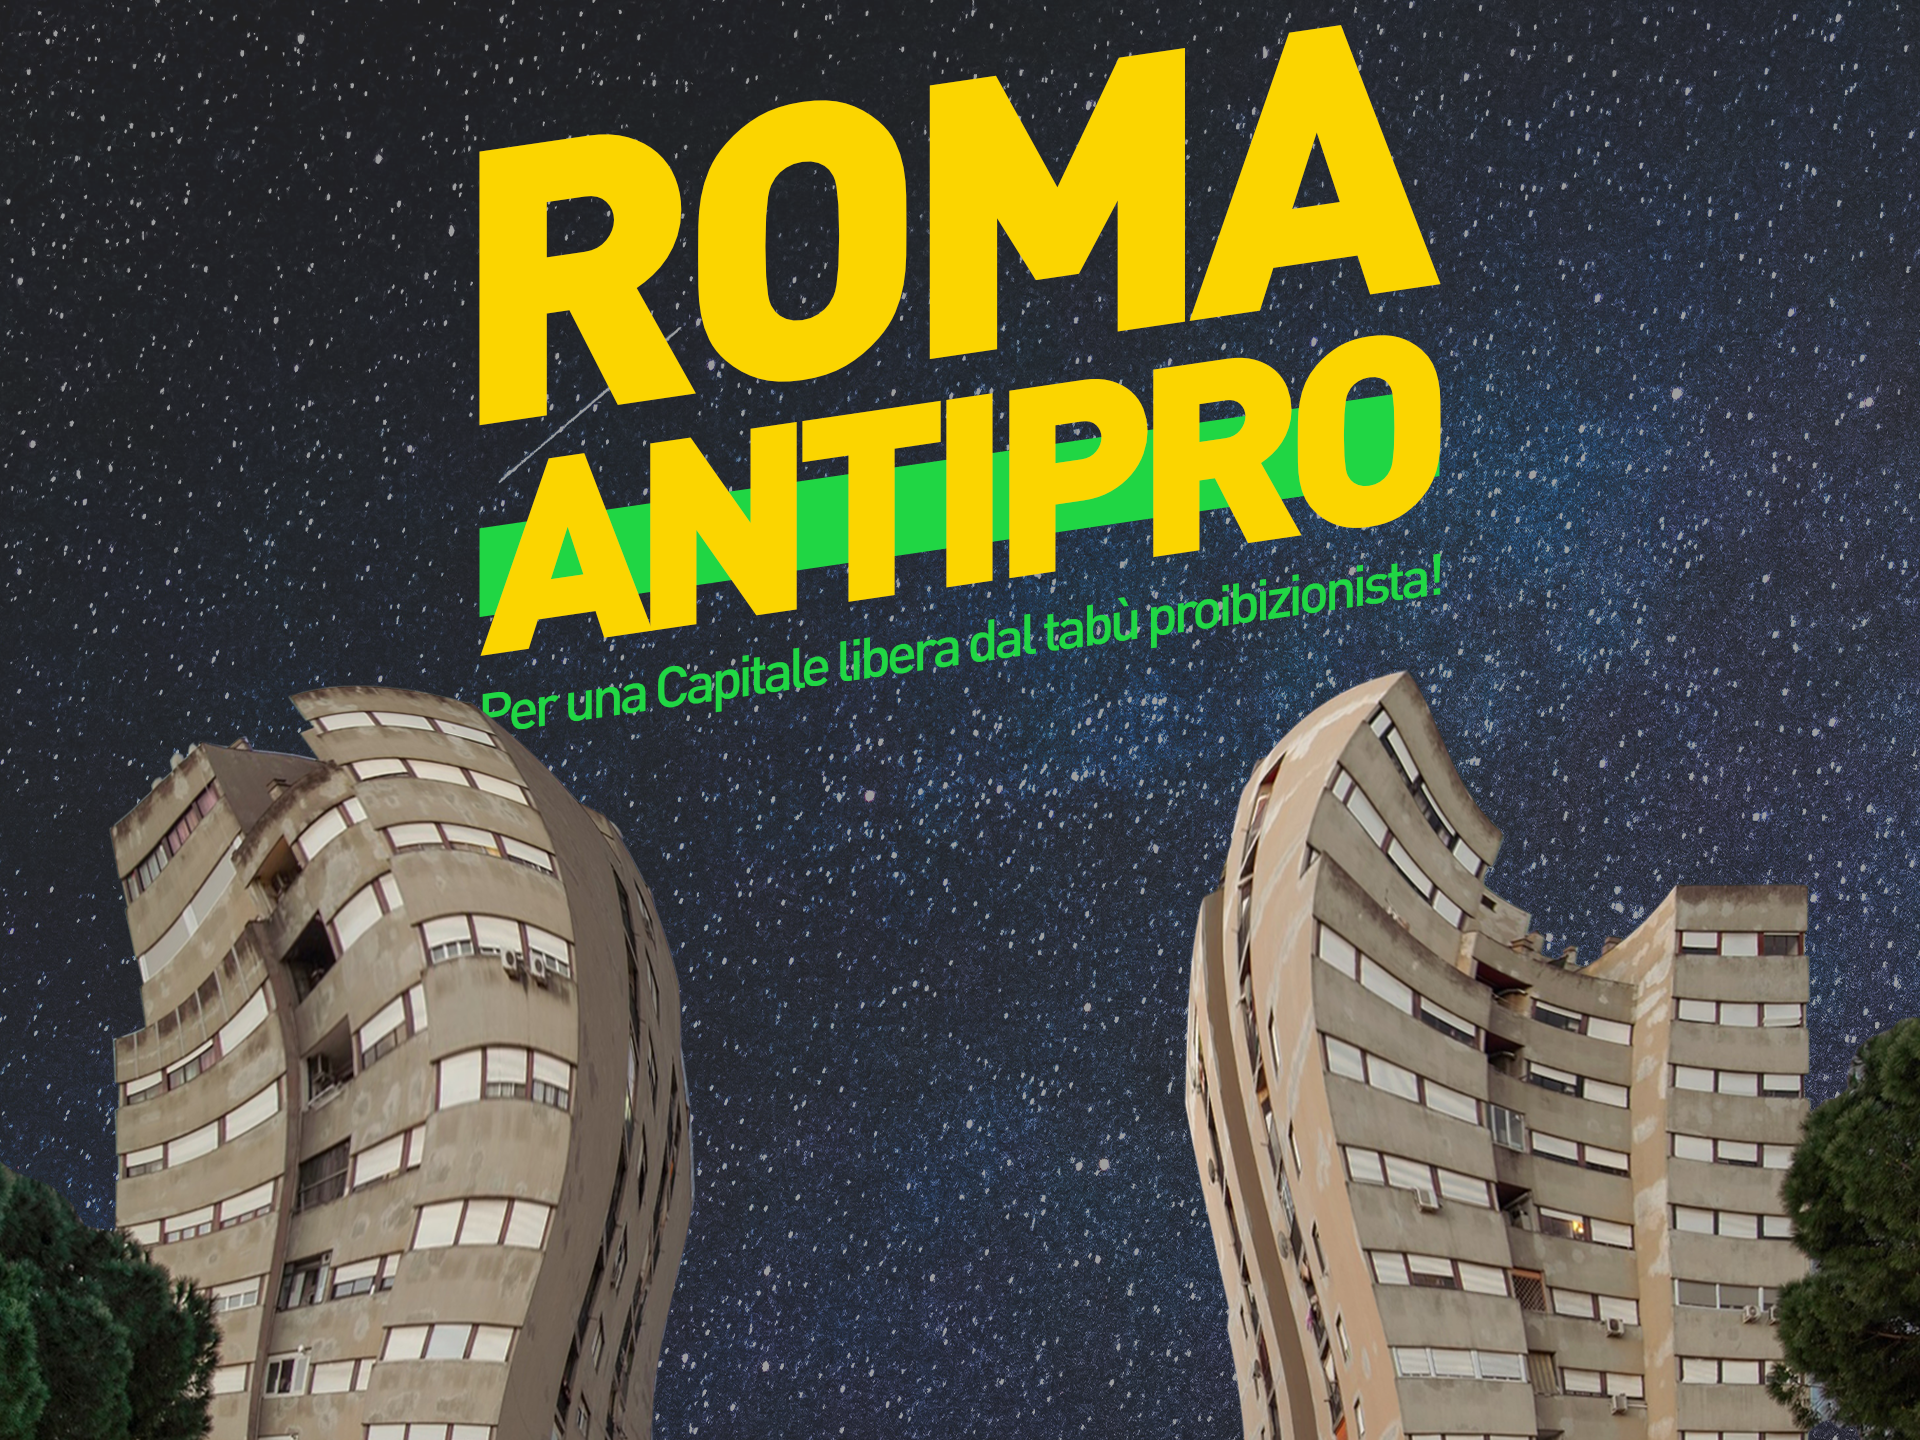 roma_antipro_.png